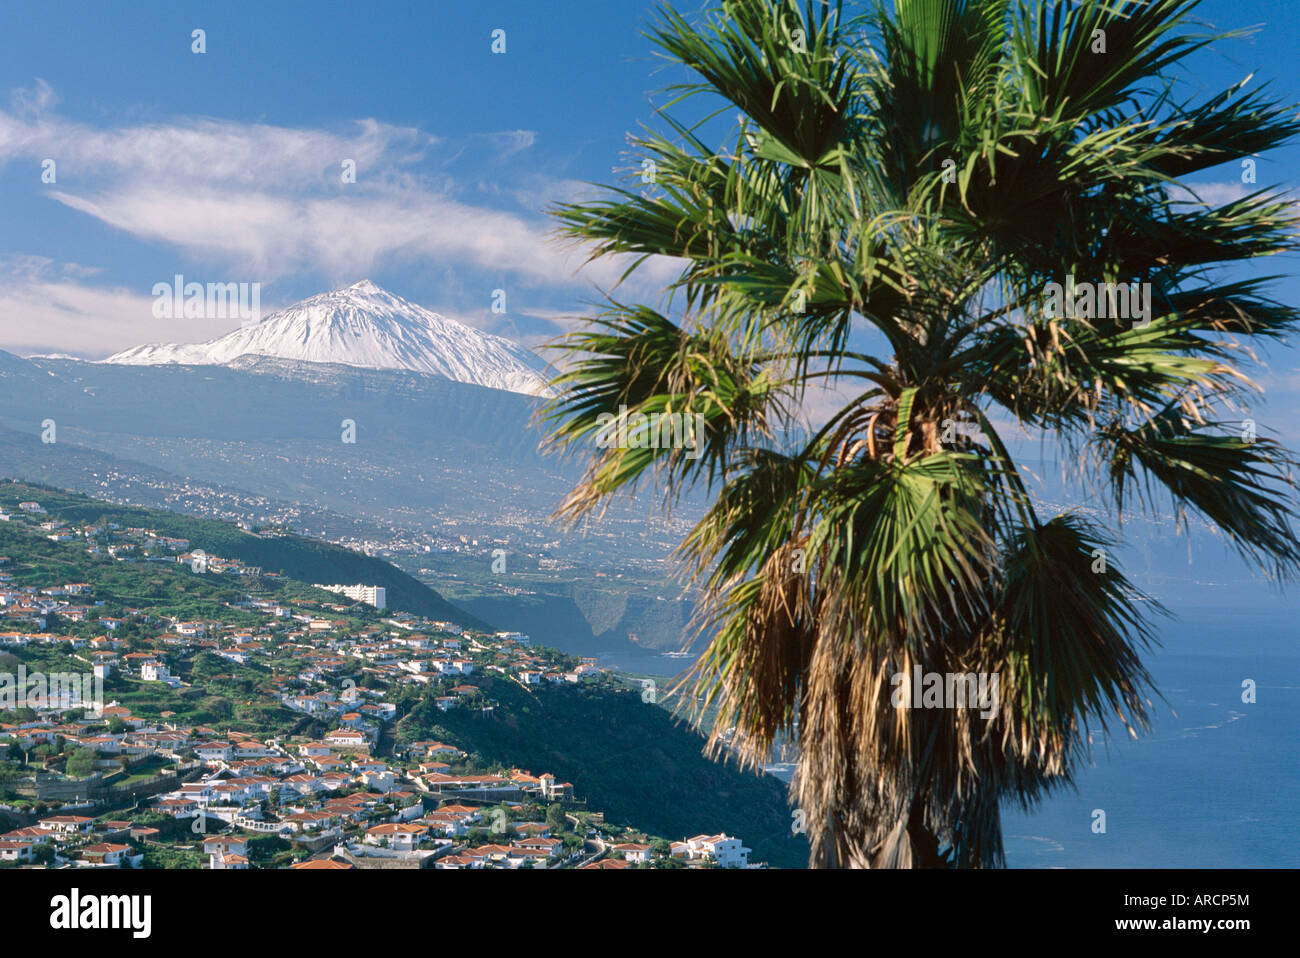 North coast and Mount Teide, Tenerife, Canary Islands, Spain, Atlantic, Europe - Stock Image